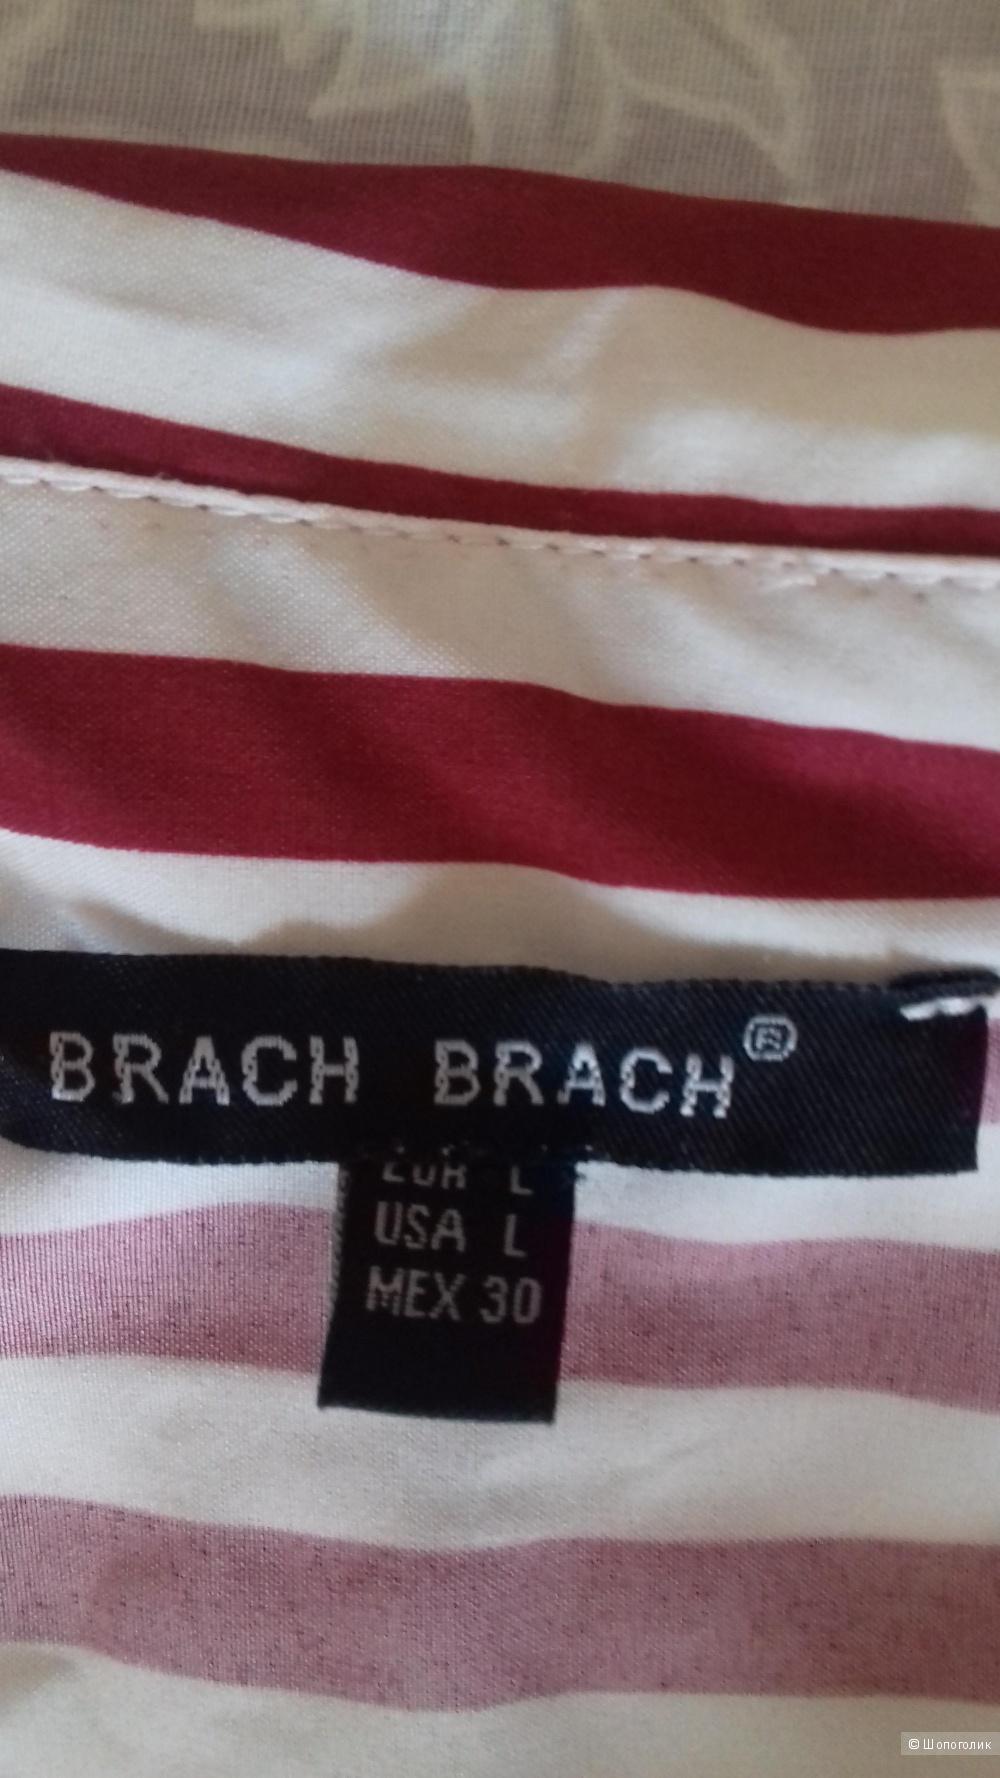 Платье-рубашка Brach Brach р. L ( русский 48-52 ).